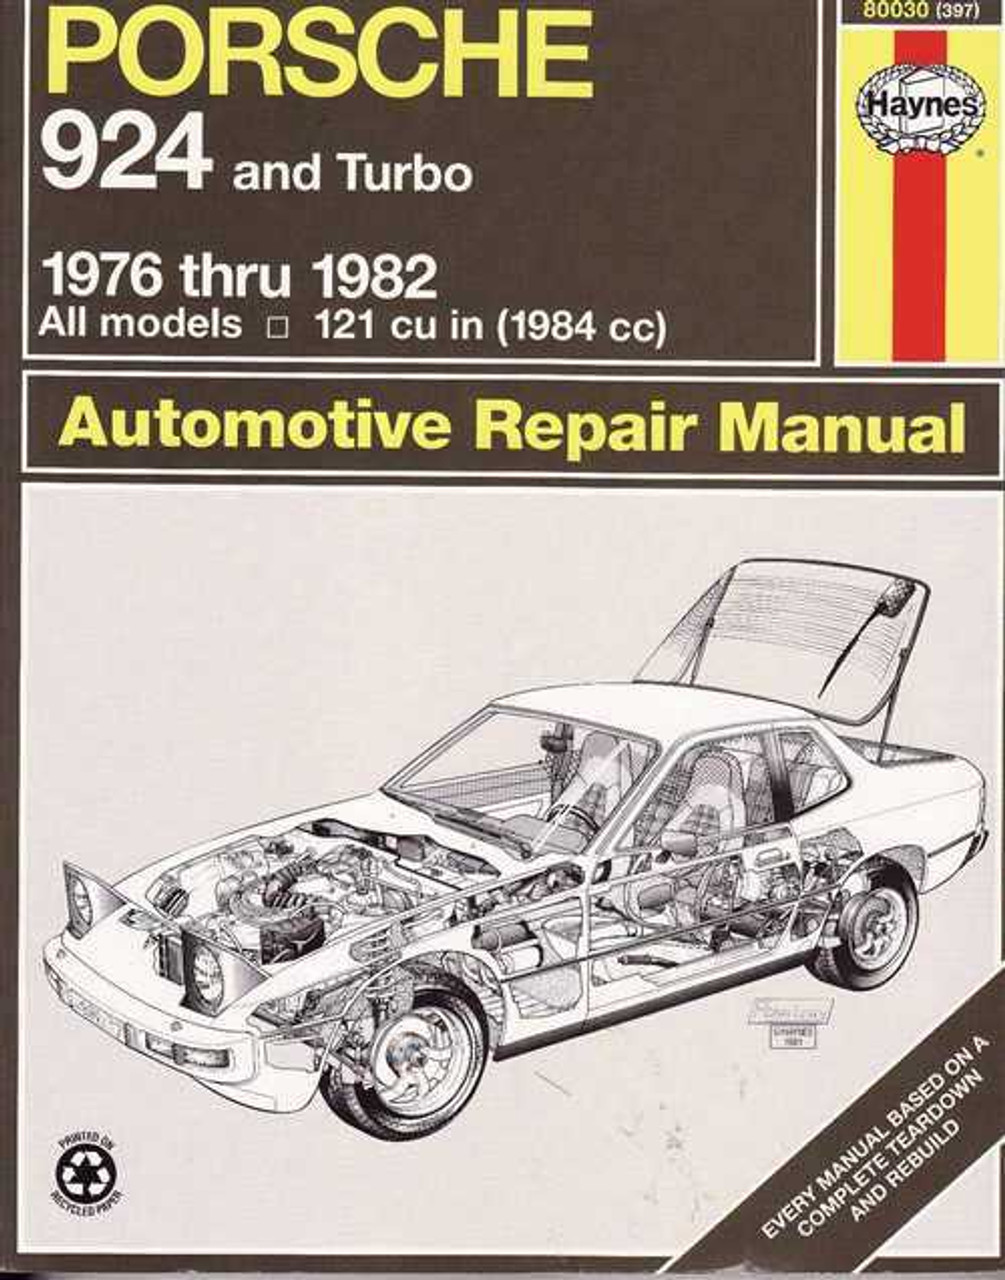 porsche 924 and turbo 1976 1982 workshop manual rh automotobookshop com au porsche 924 workshop manual porsche 924 owners workshop manual